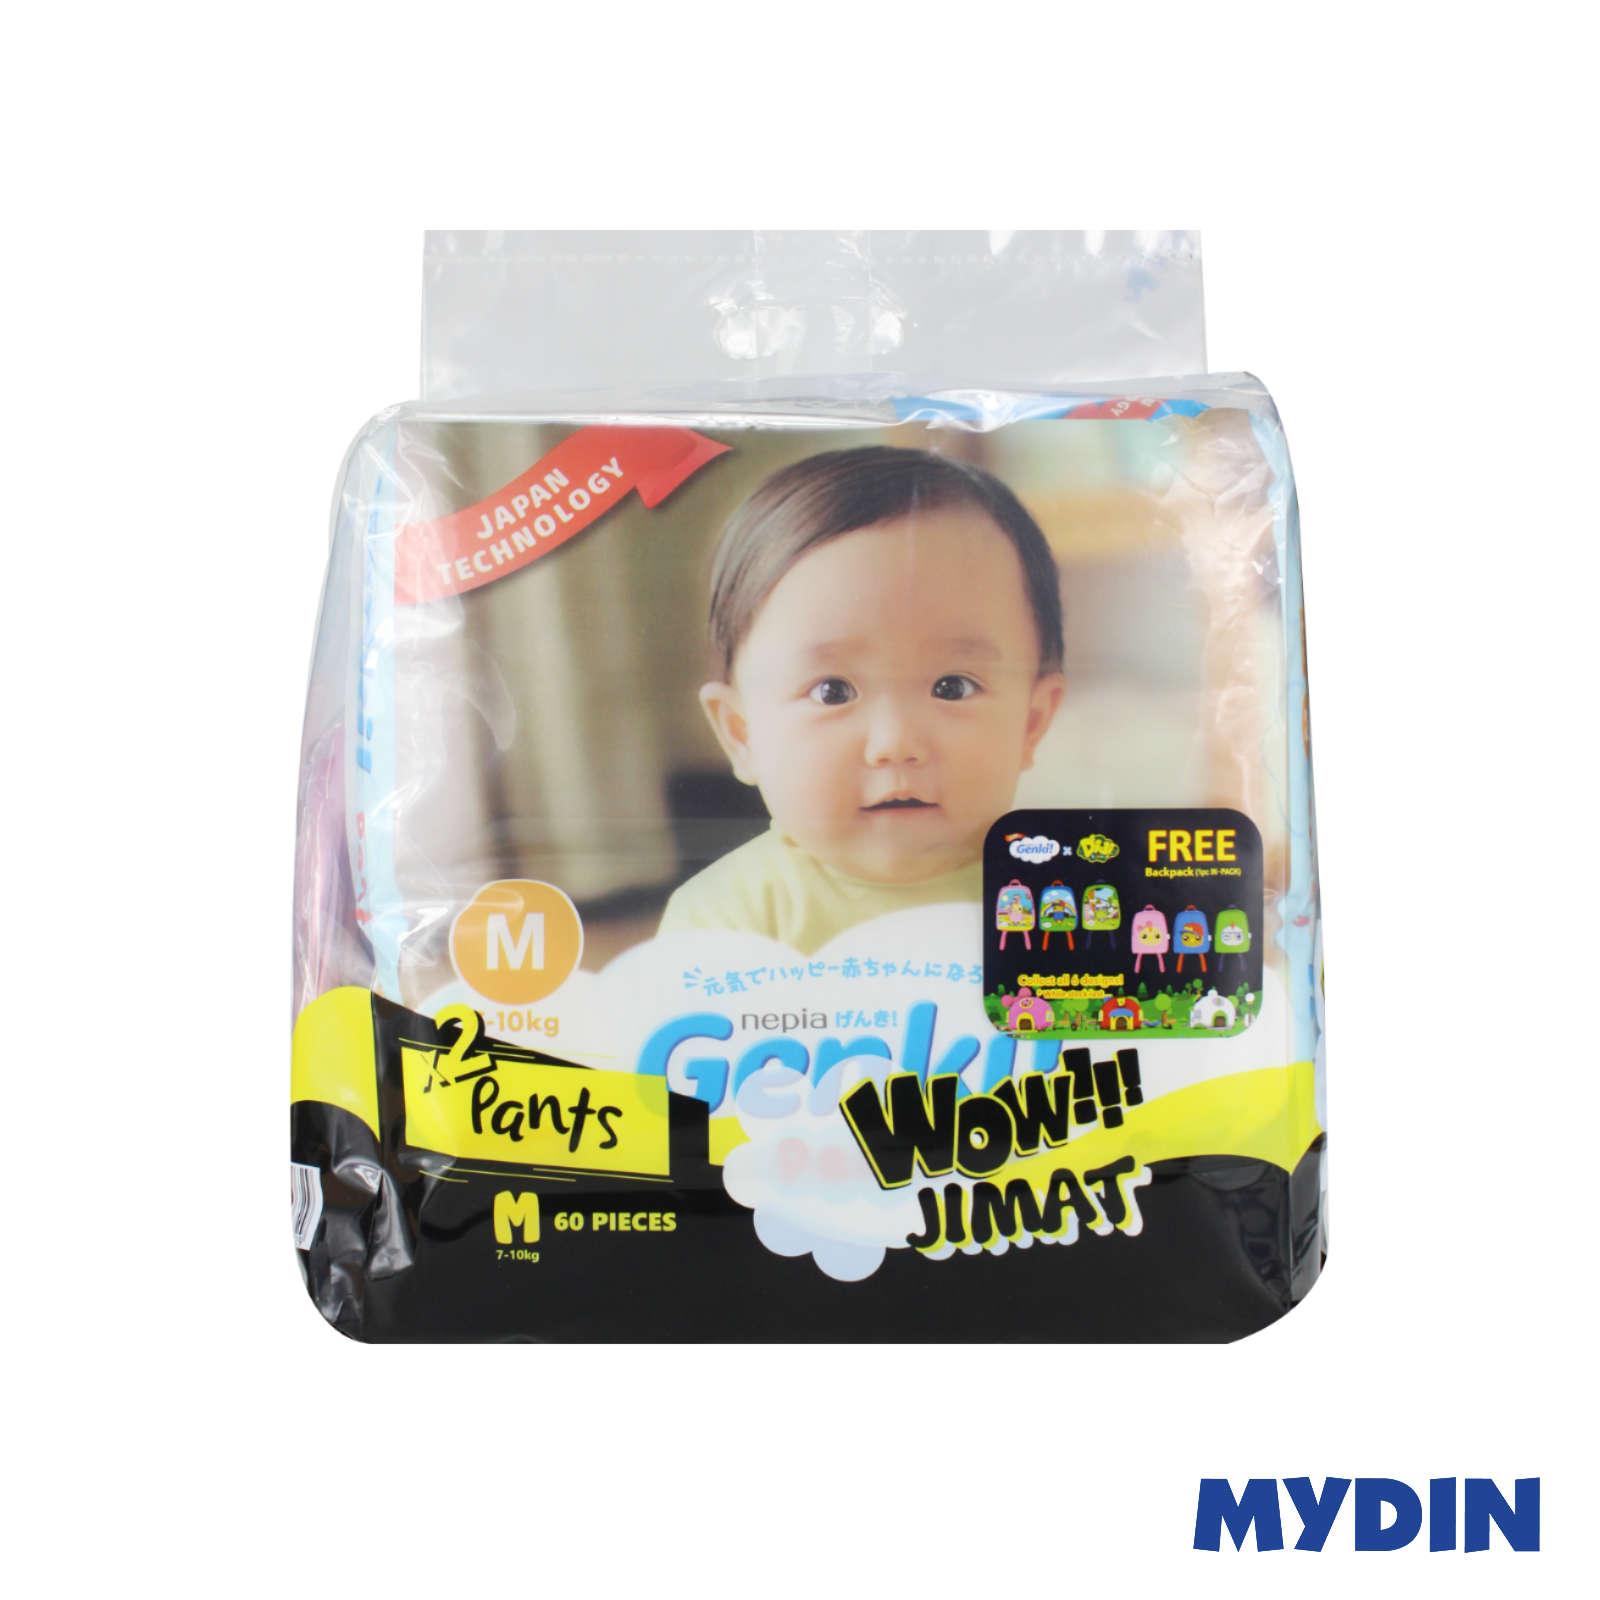 Genki Pants Mega Twinpack M (60pcs x 2) FOC Assorted Didi & Friends Backpack (While Stock Lasts)